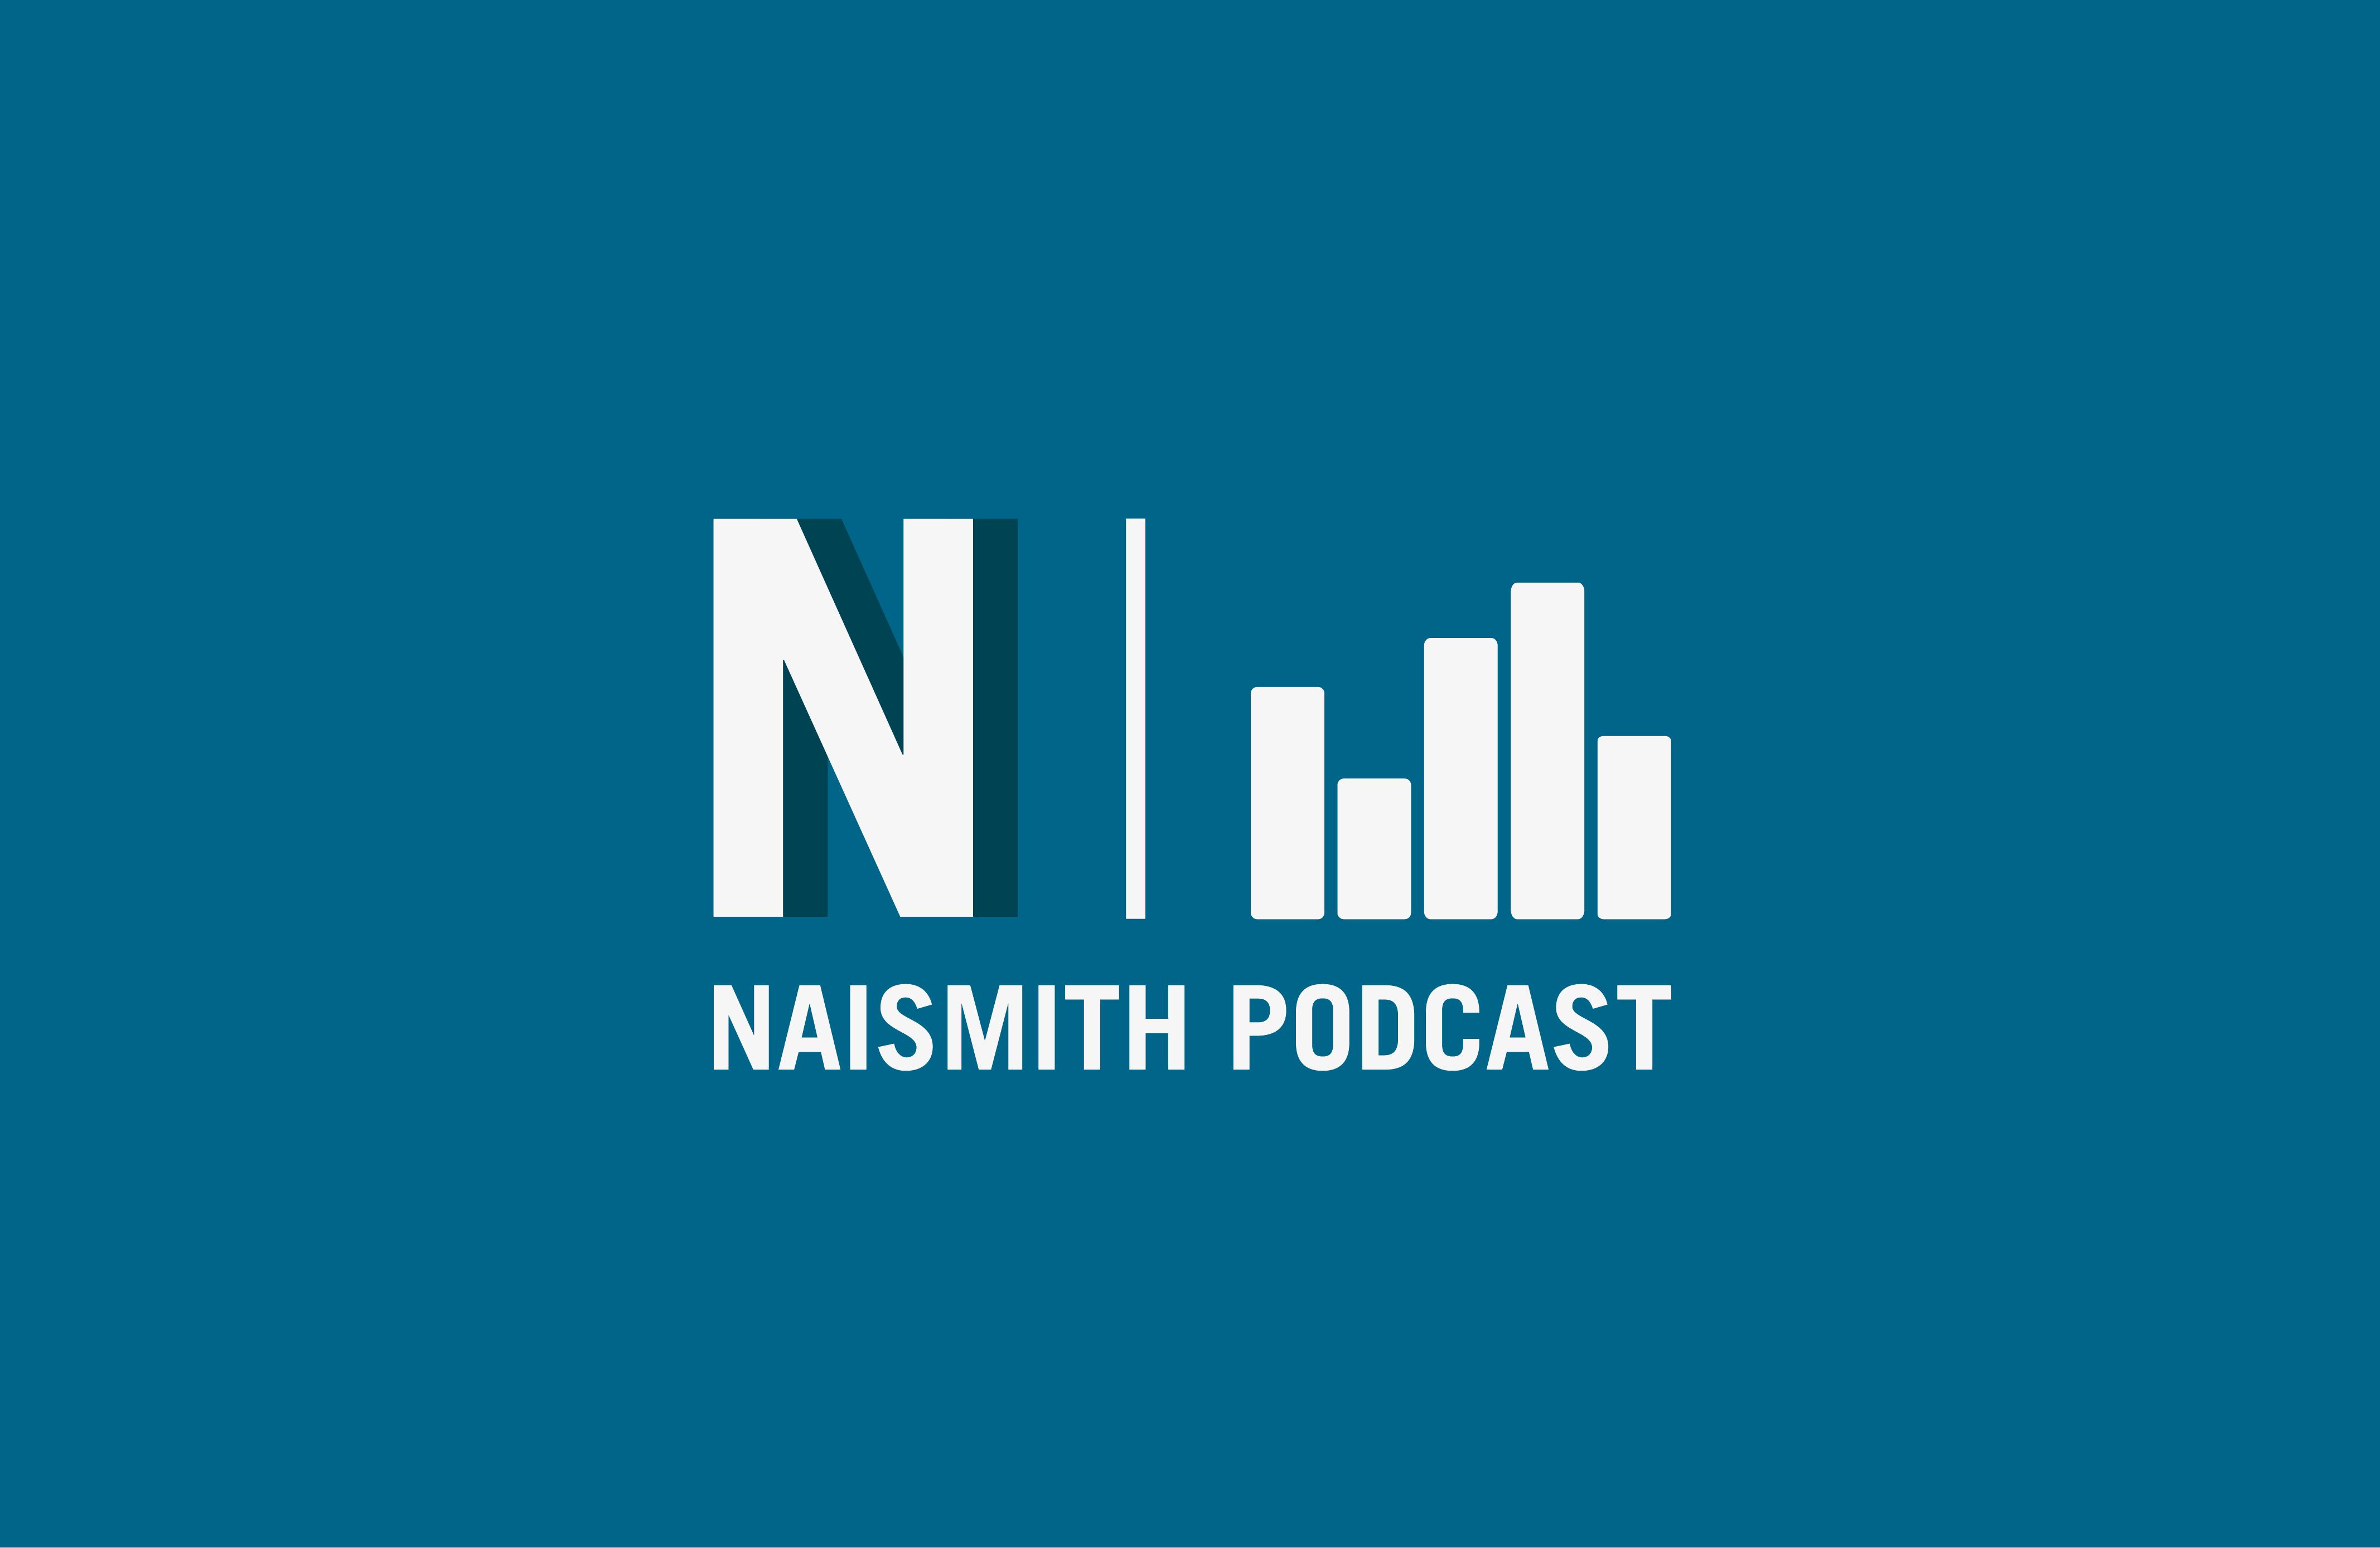 naismith.dk_philipjohansen_podcast